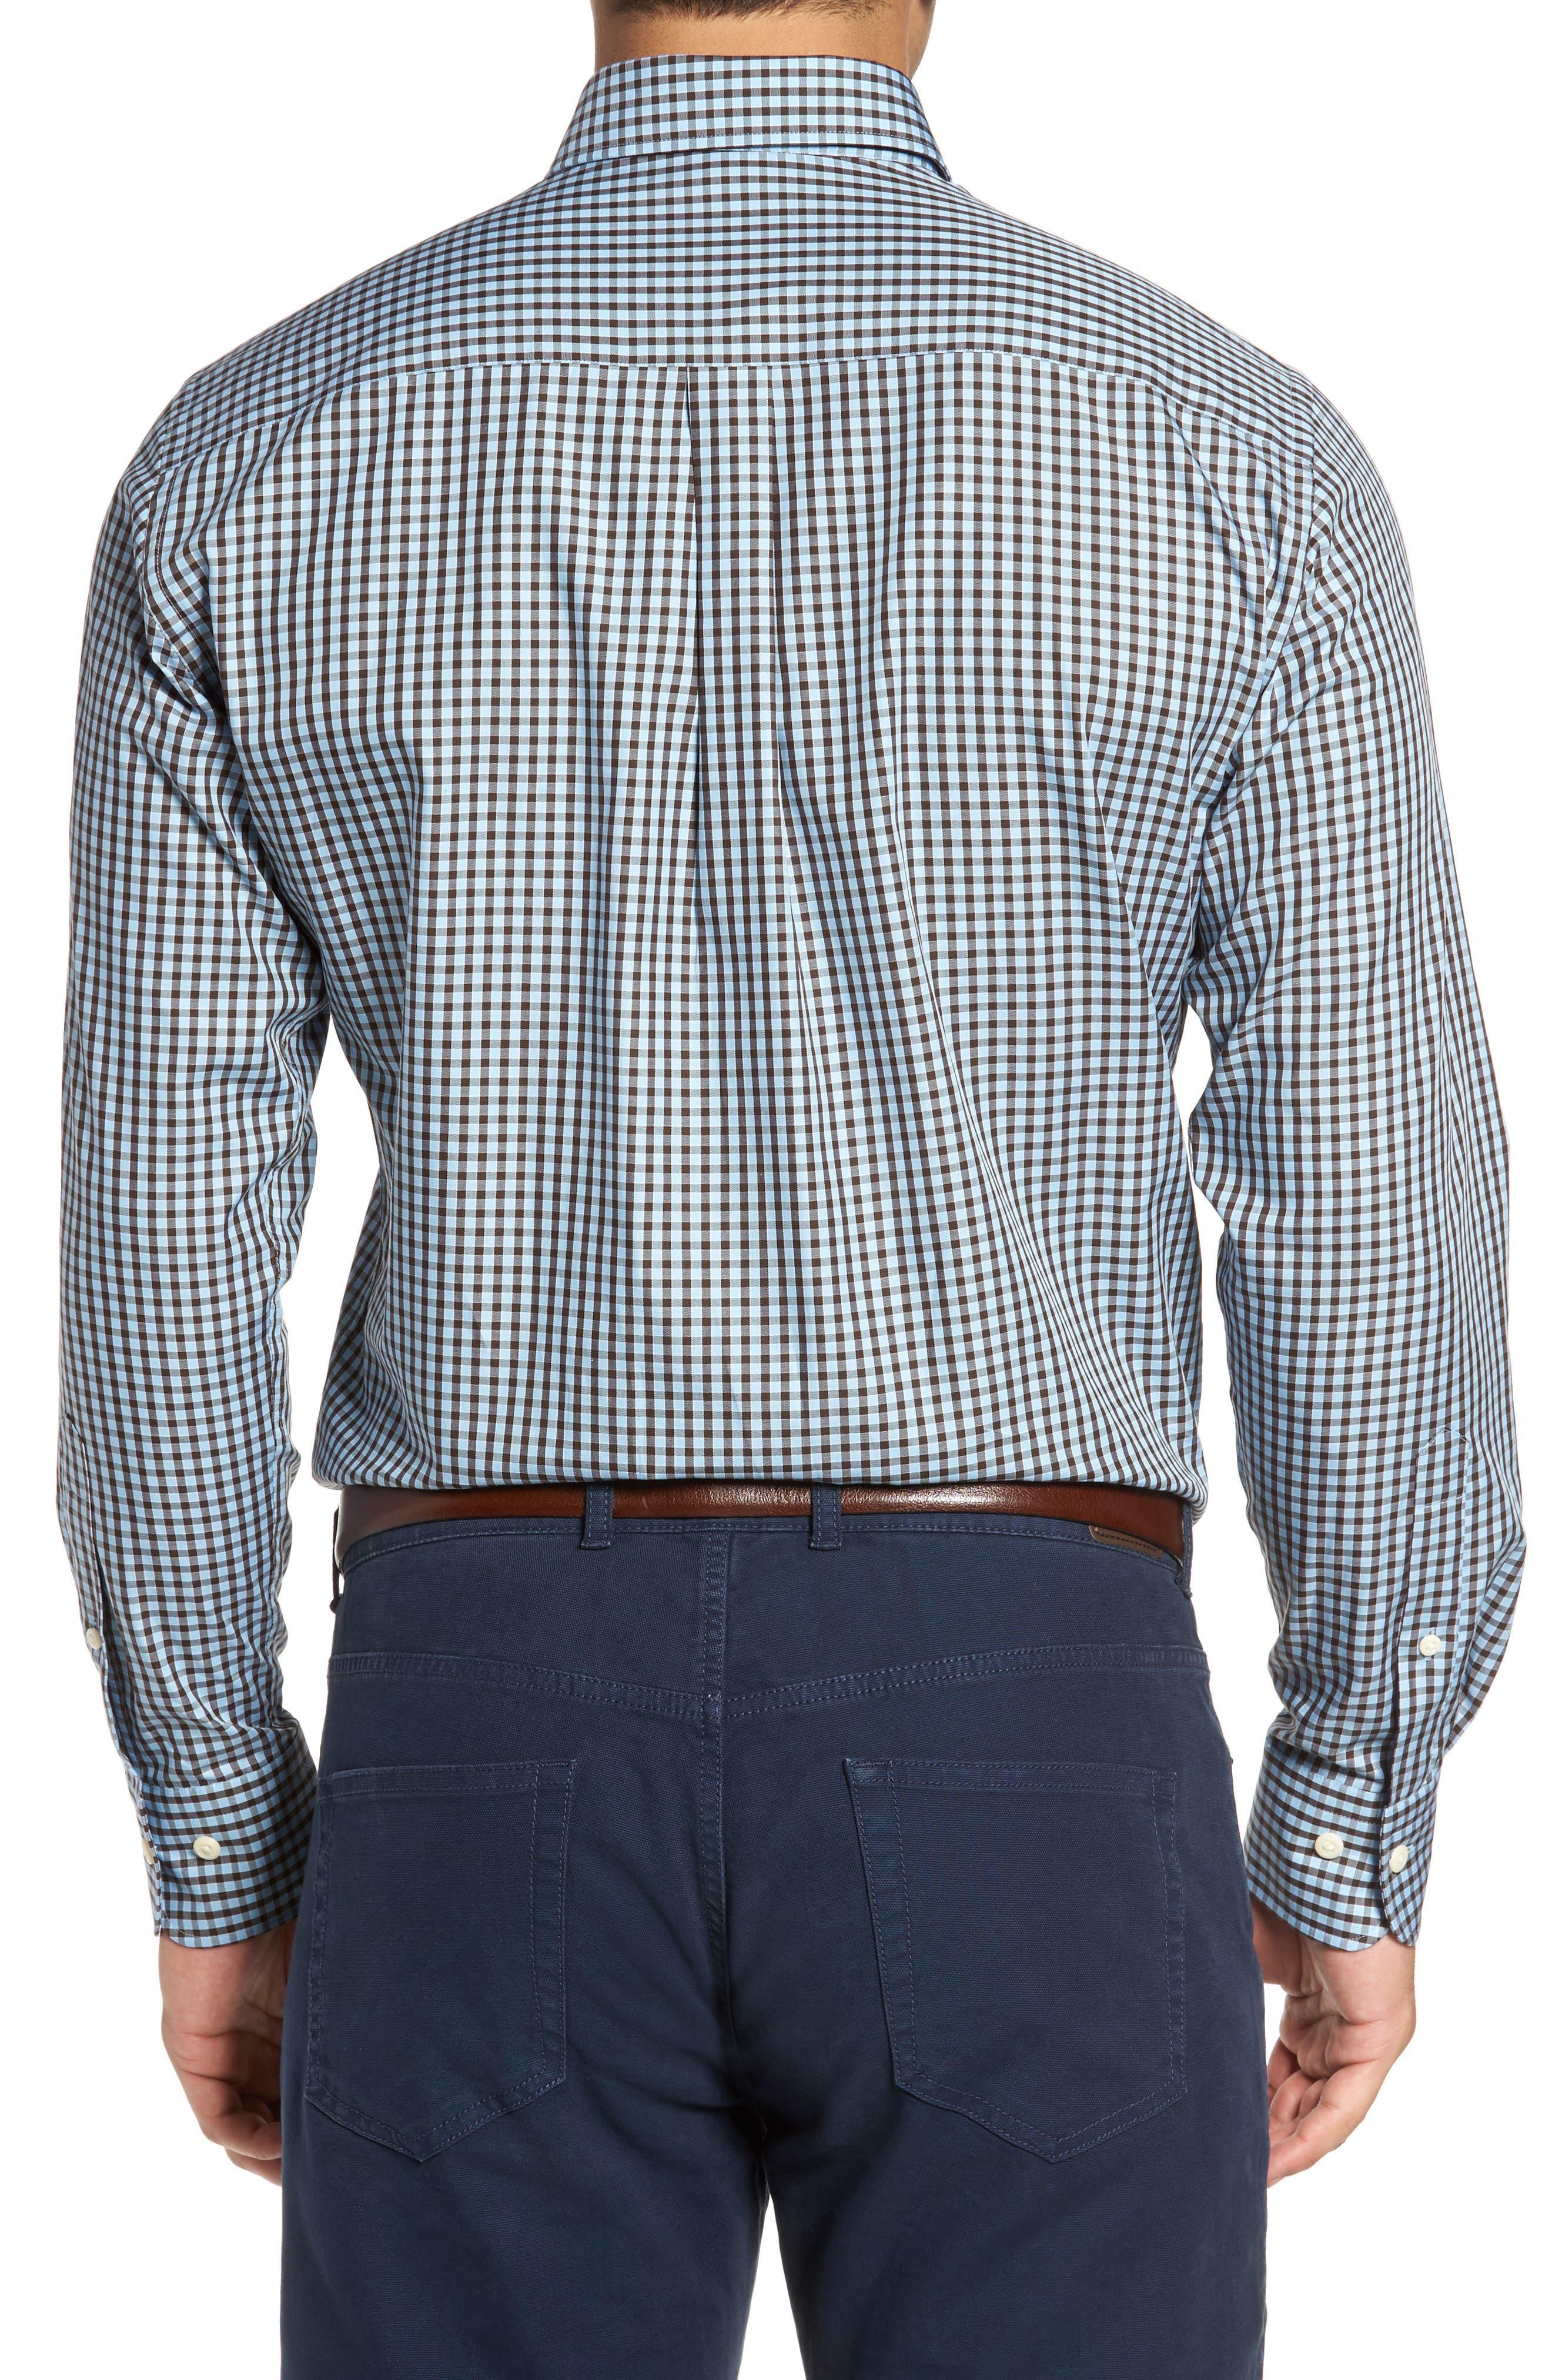 Alternate Image 2  - Peter Millar Midwinter Gingham Regular Fit Sport Shirt